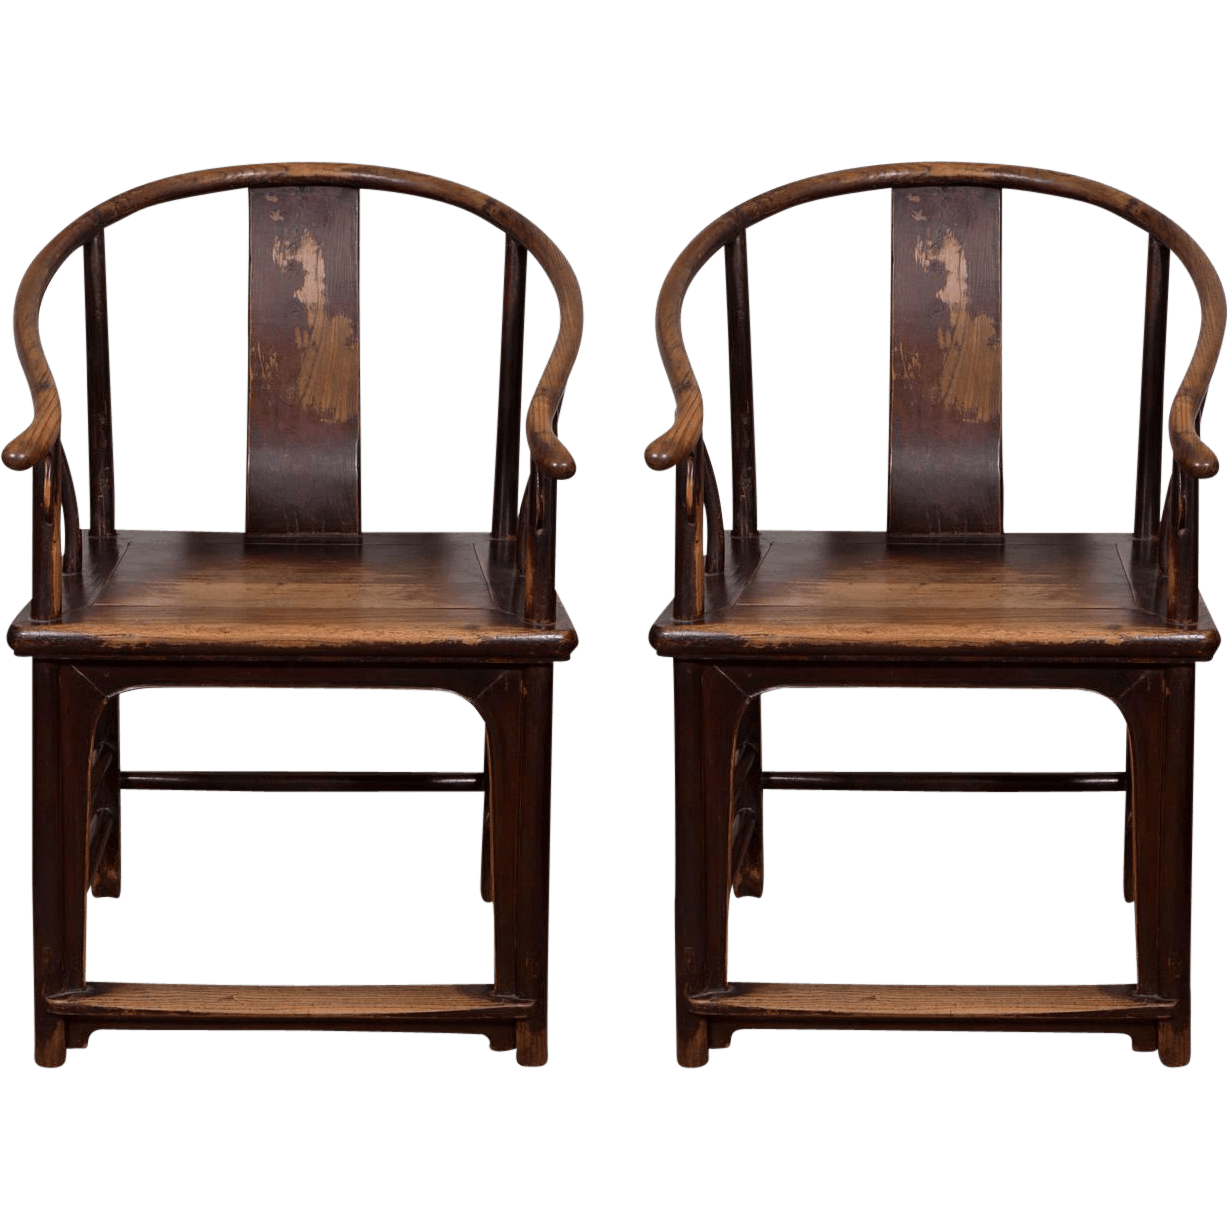 A Pair of 18th Century Chinese Horseshoe Chairs : Jonathan